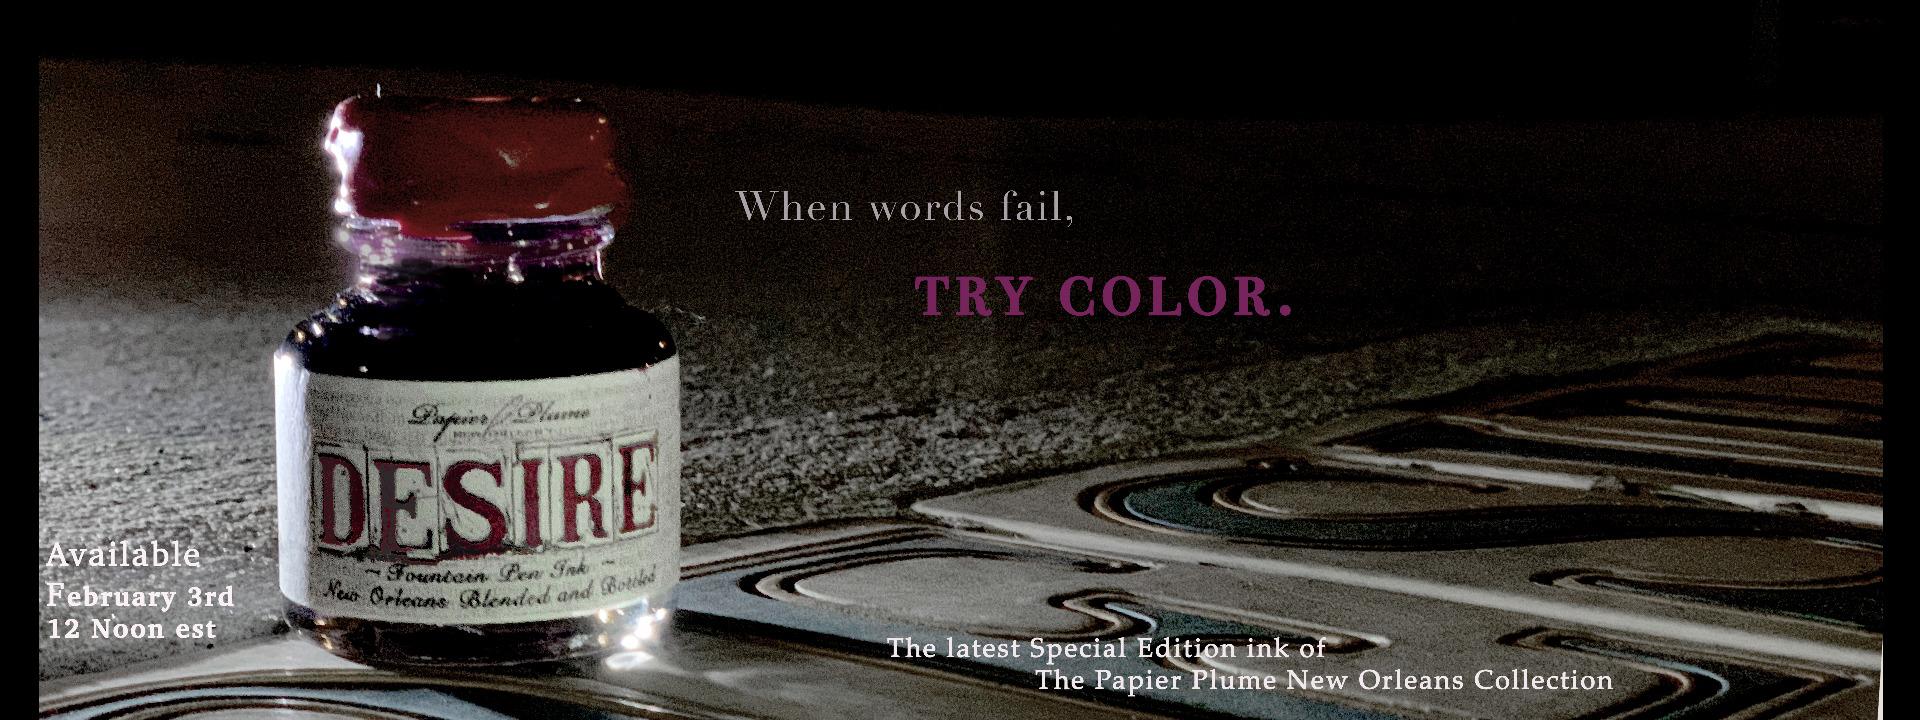 Desire Ink